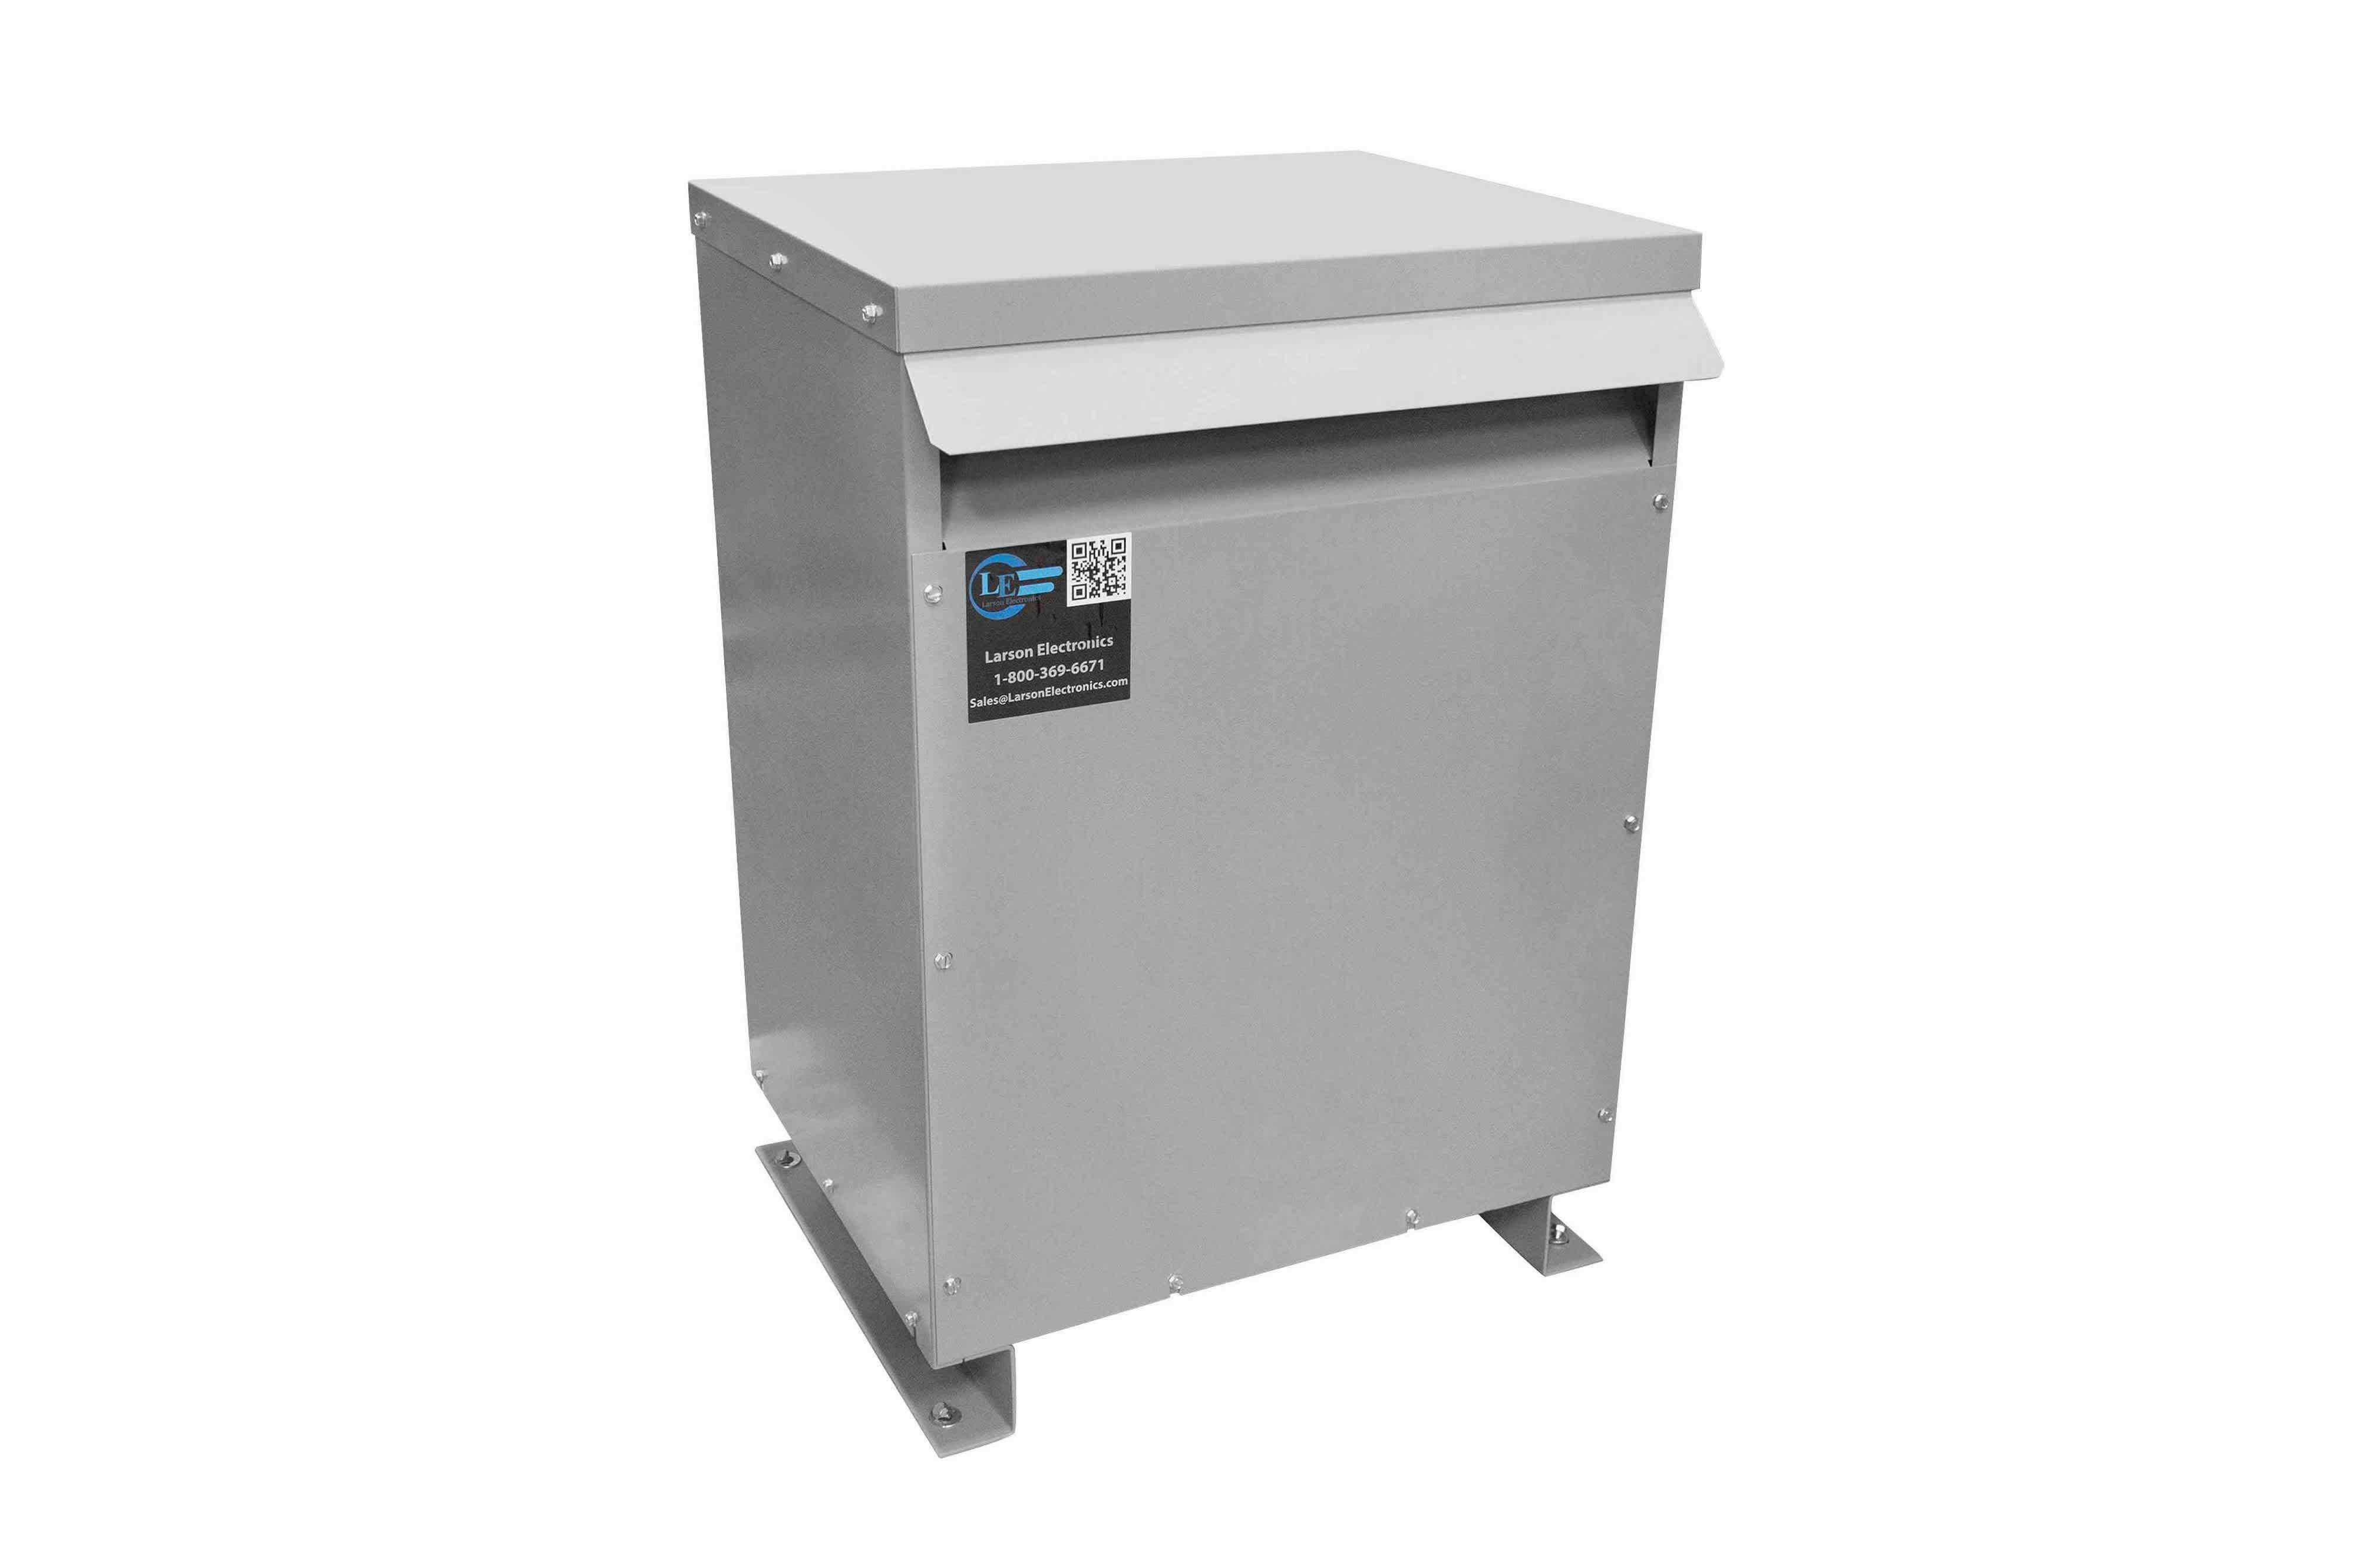 55 kVA 3PH Isolation Transformer, 575V Wye Primary, 208Y/120 Wye-N Secondary, N3R, Ventilated, 60 Hz